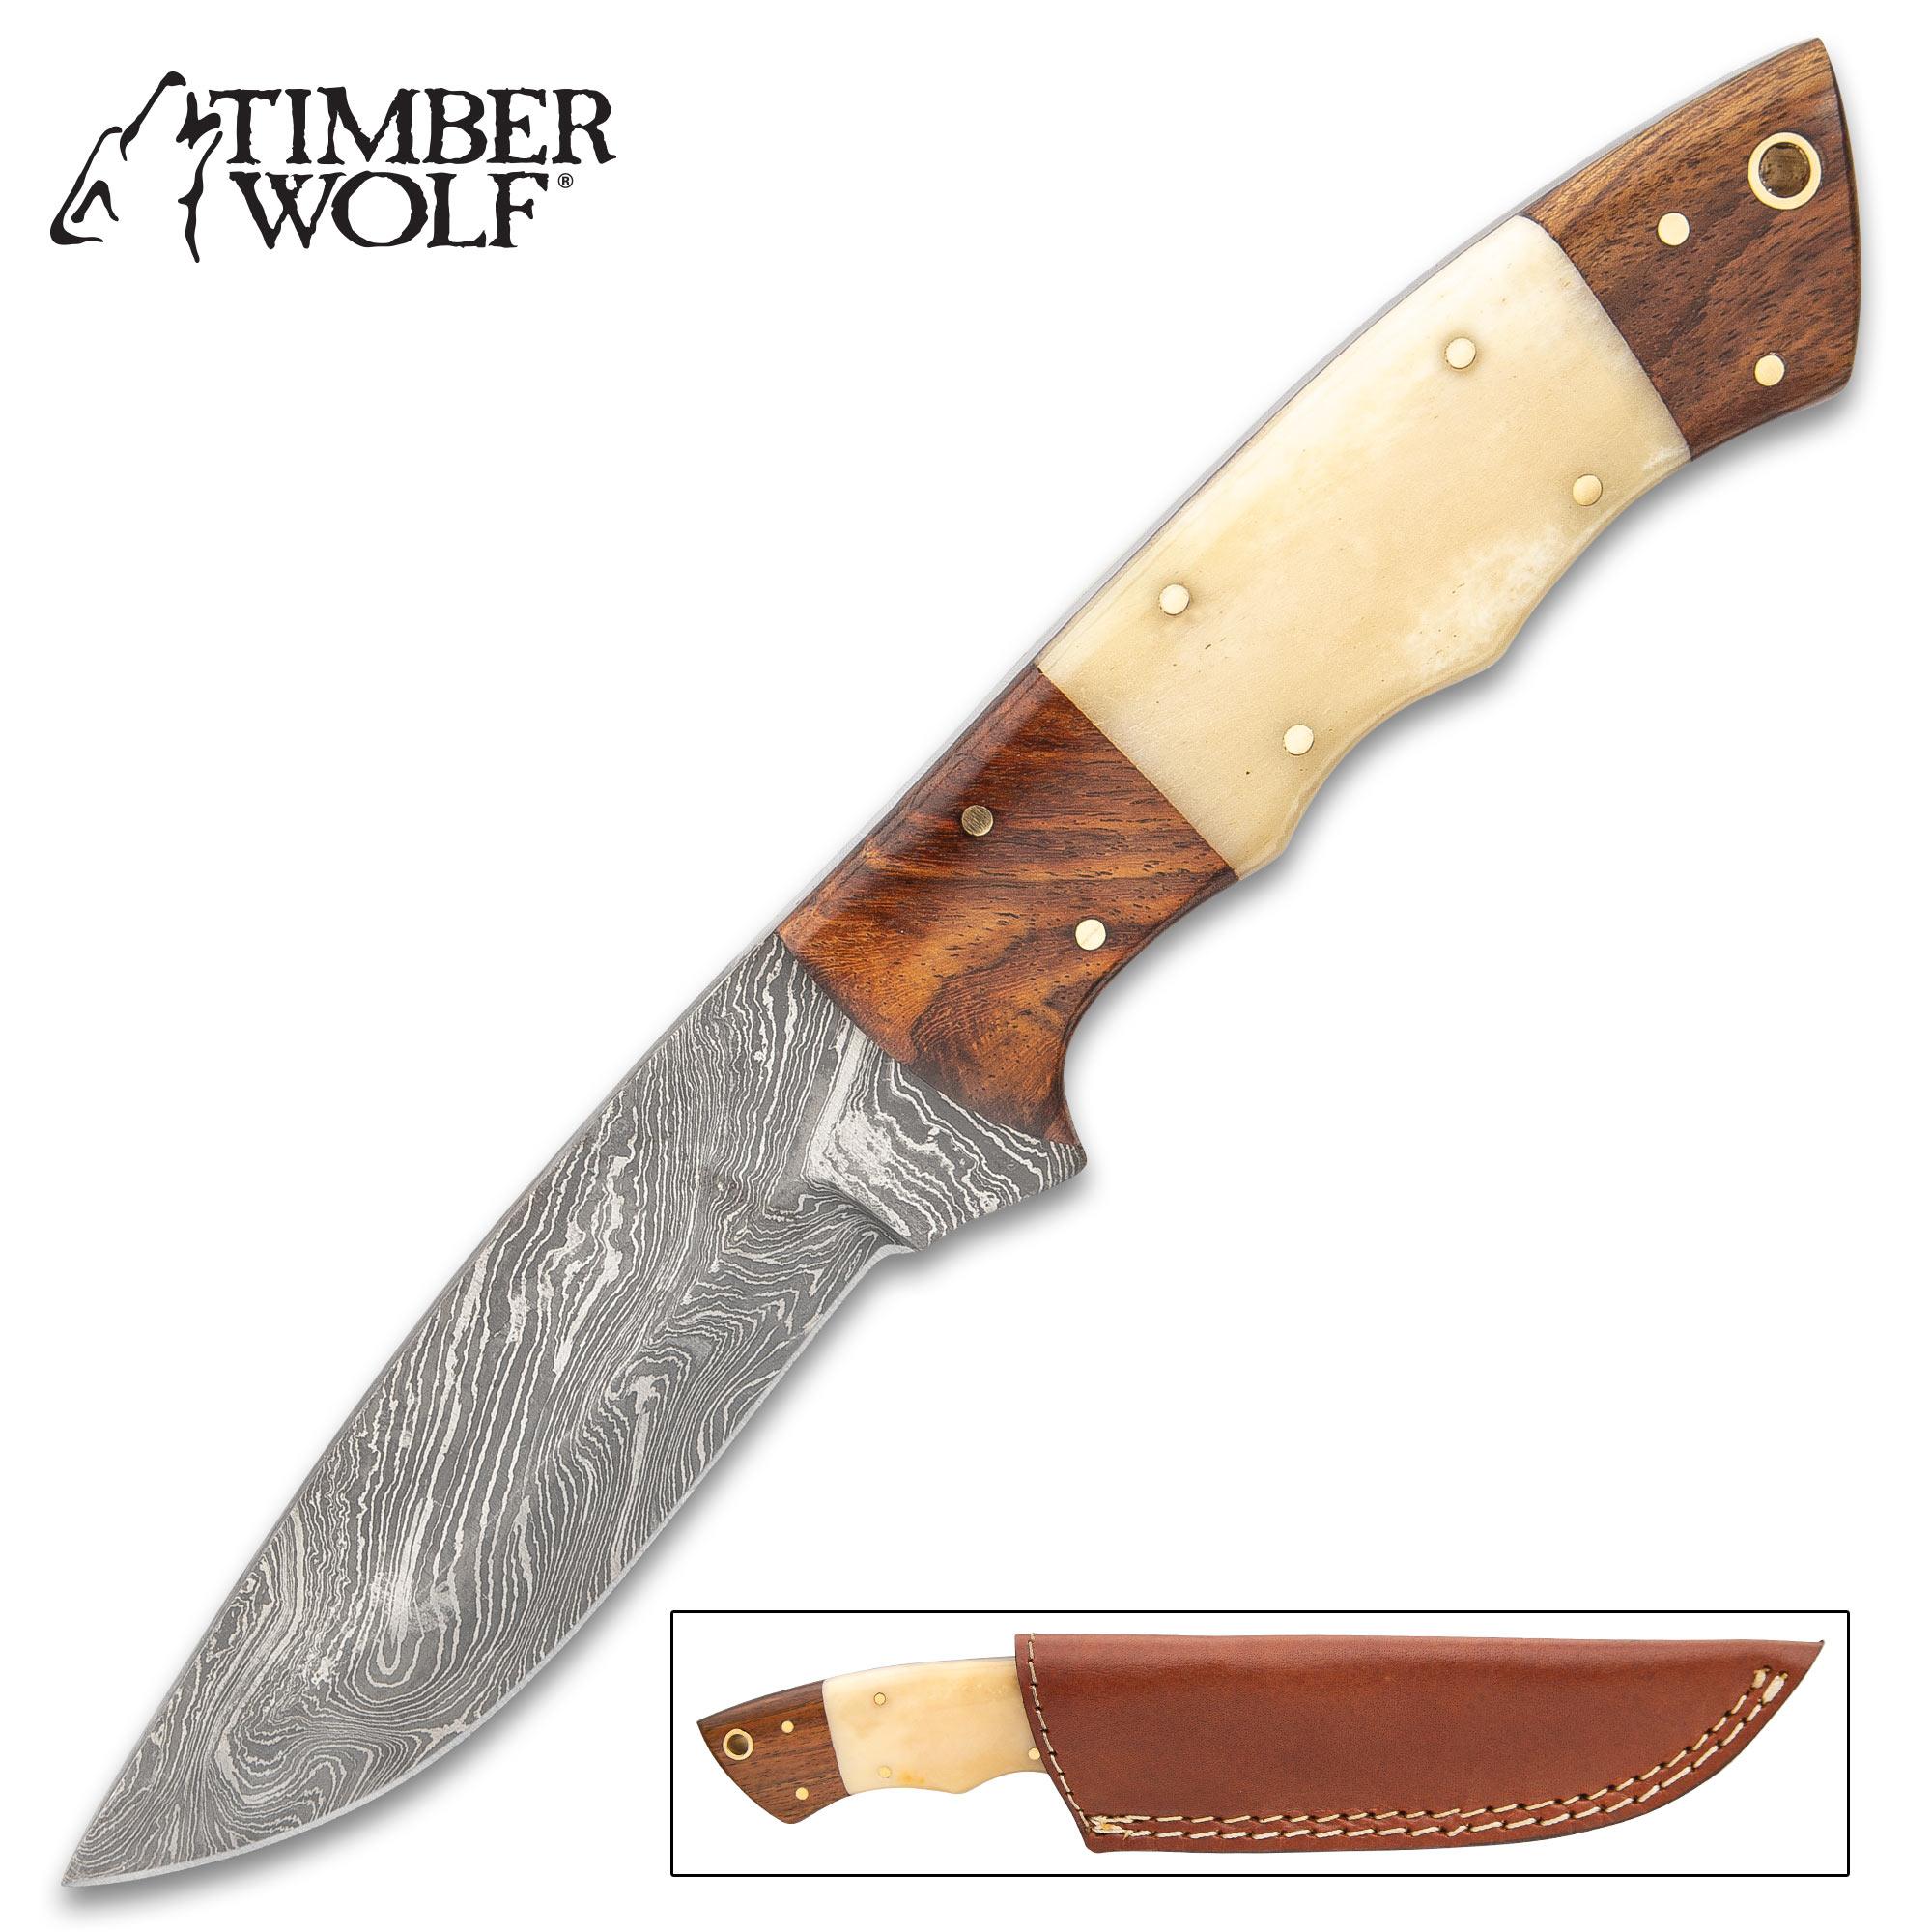 Timber Wolf Doe Run Knife With Sheath - Damascus Steel Blade